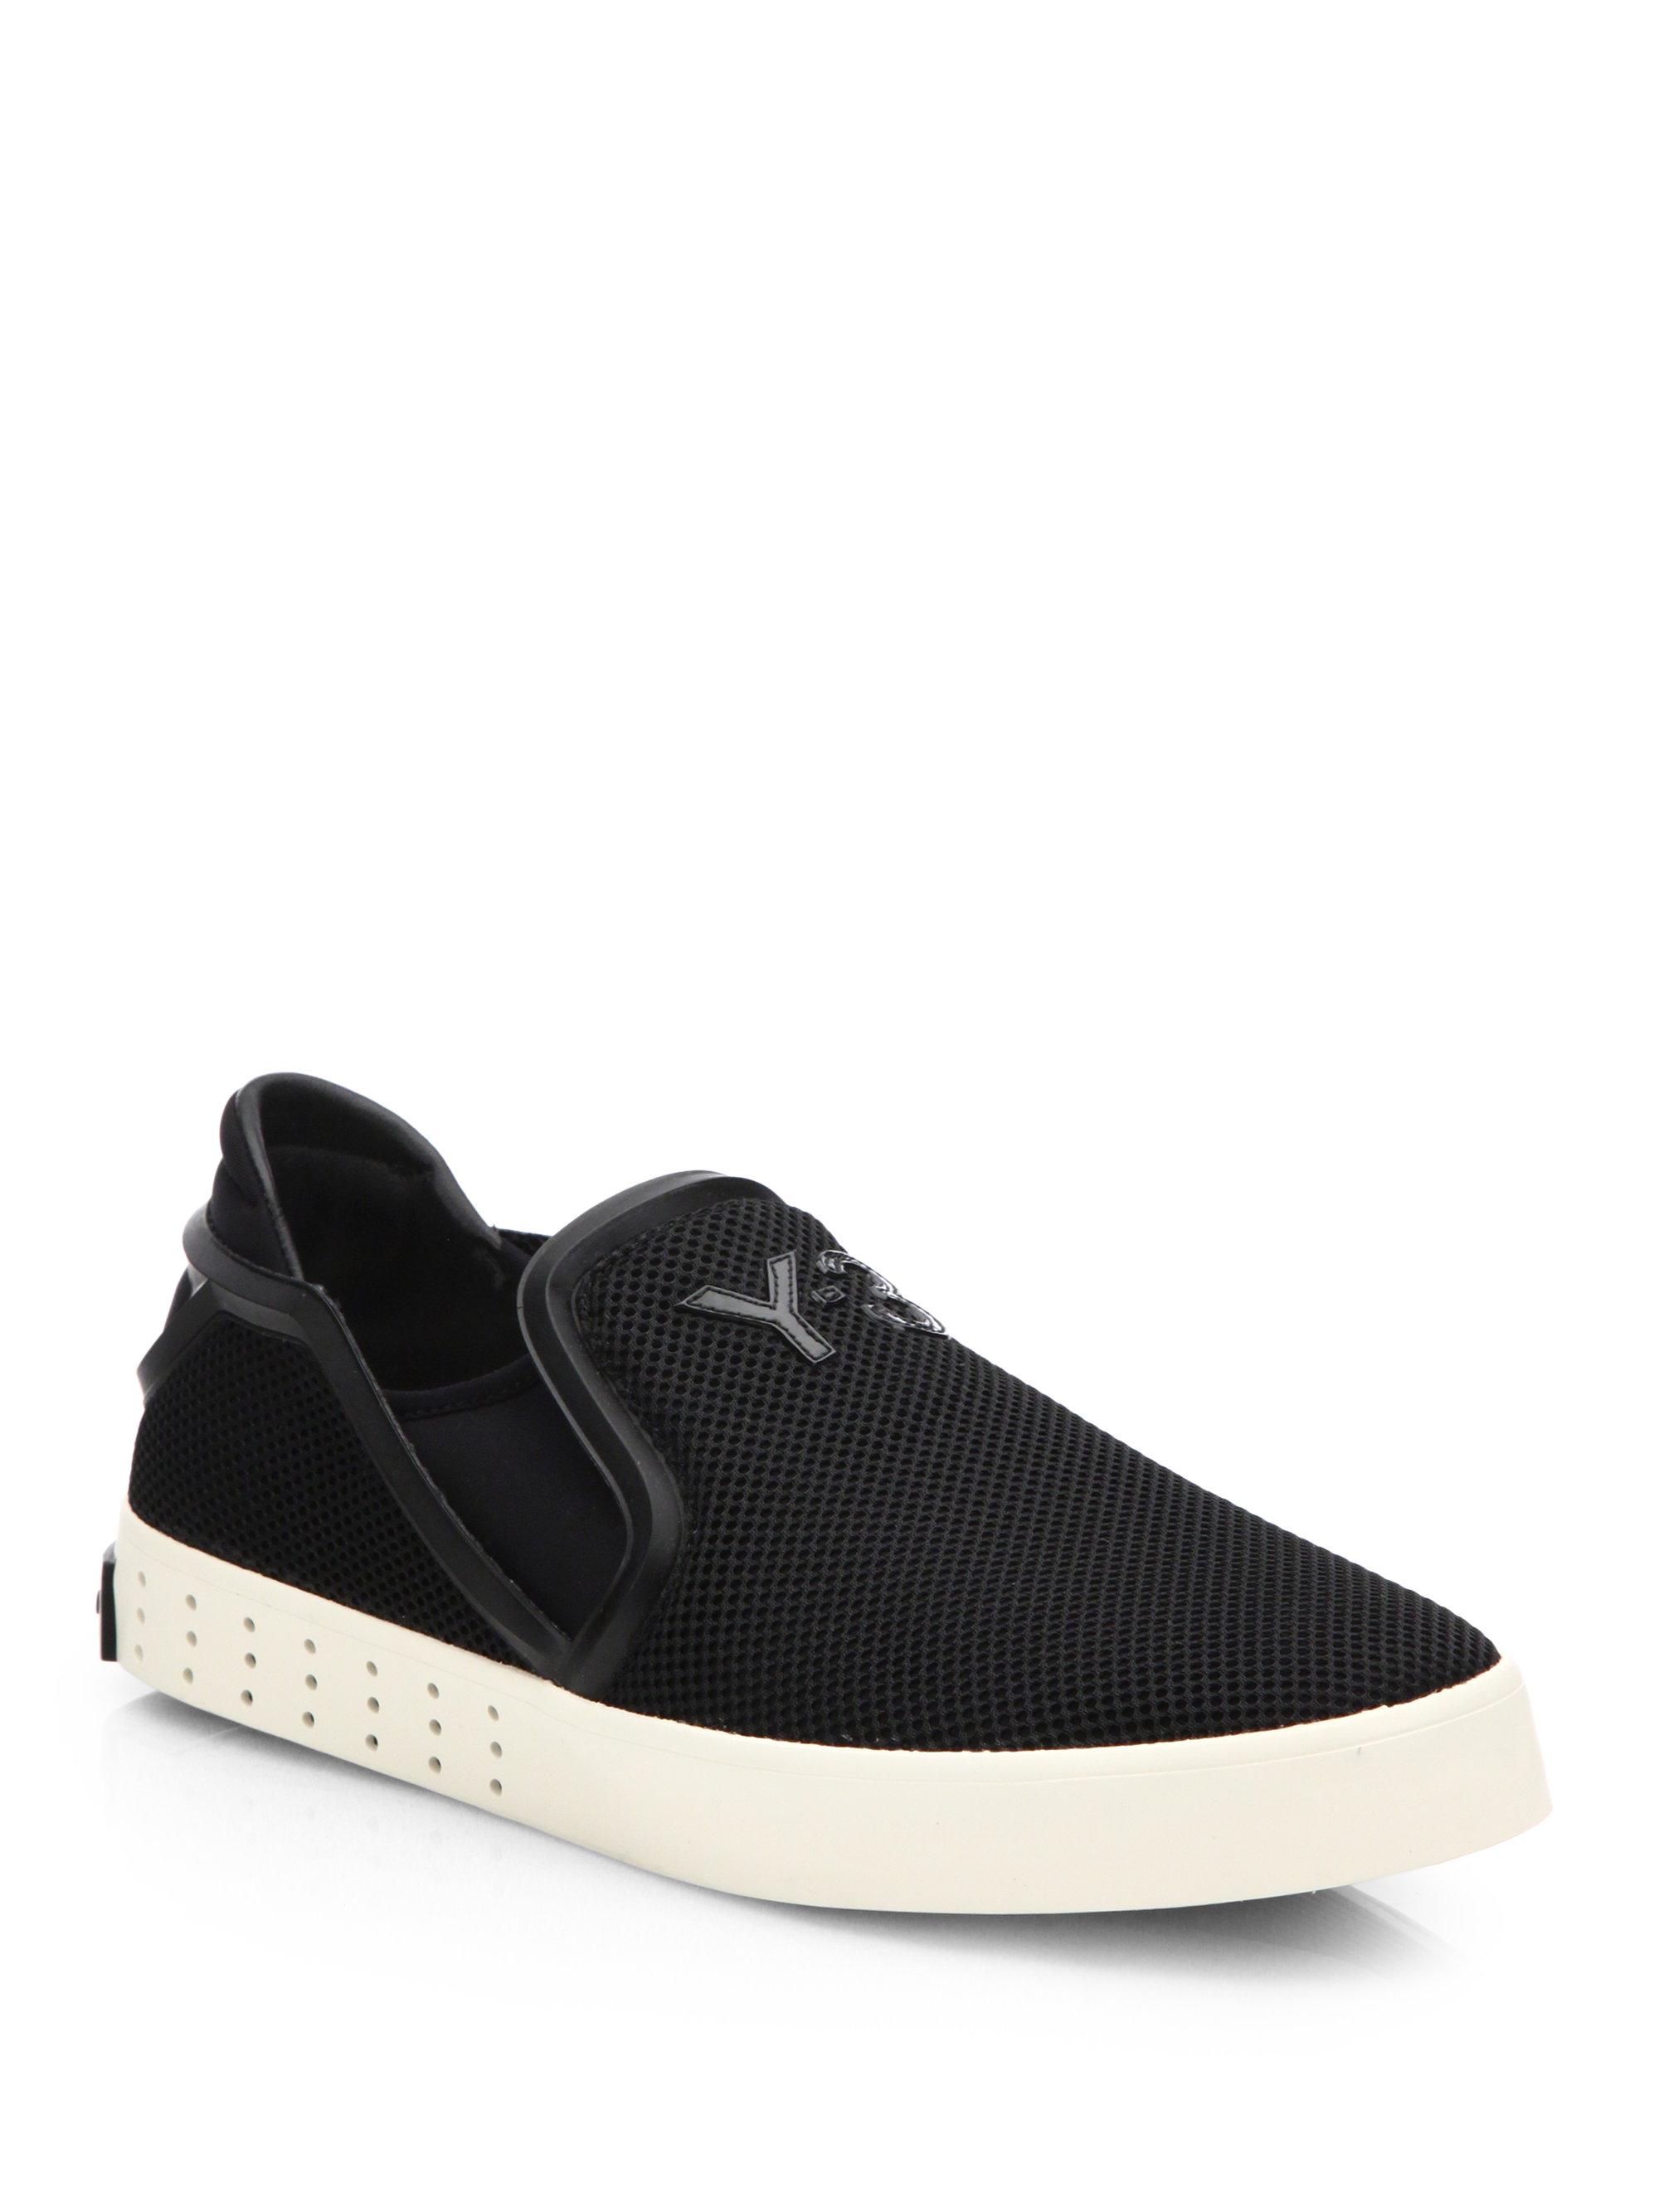 Lyst Y 3 Laver Slip On Sneakers In Black For Men